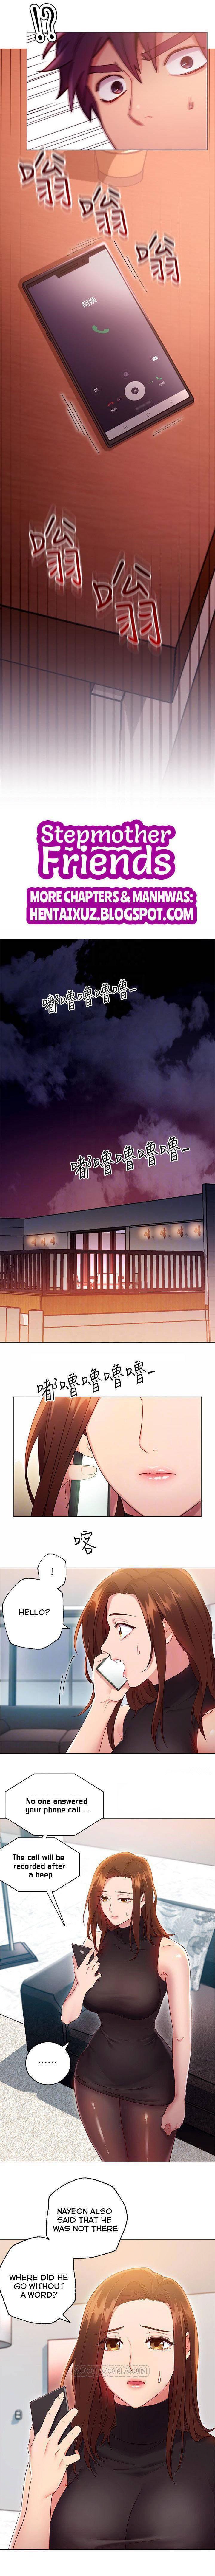 [Neck Pilllow] Stepmother Friends Ch.40/? [English] [Hentai Universe] NEW! 22/10/2020 123